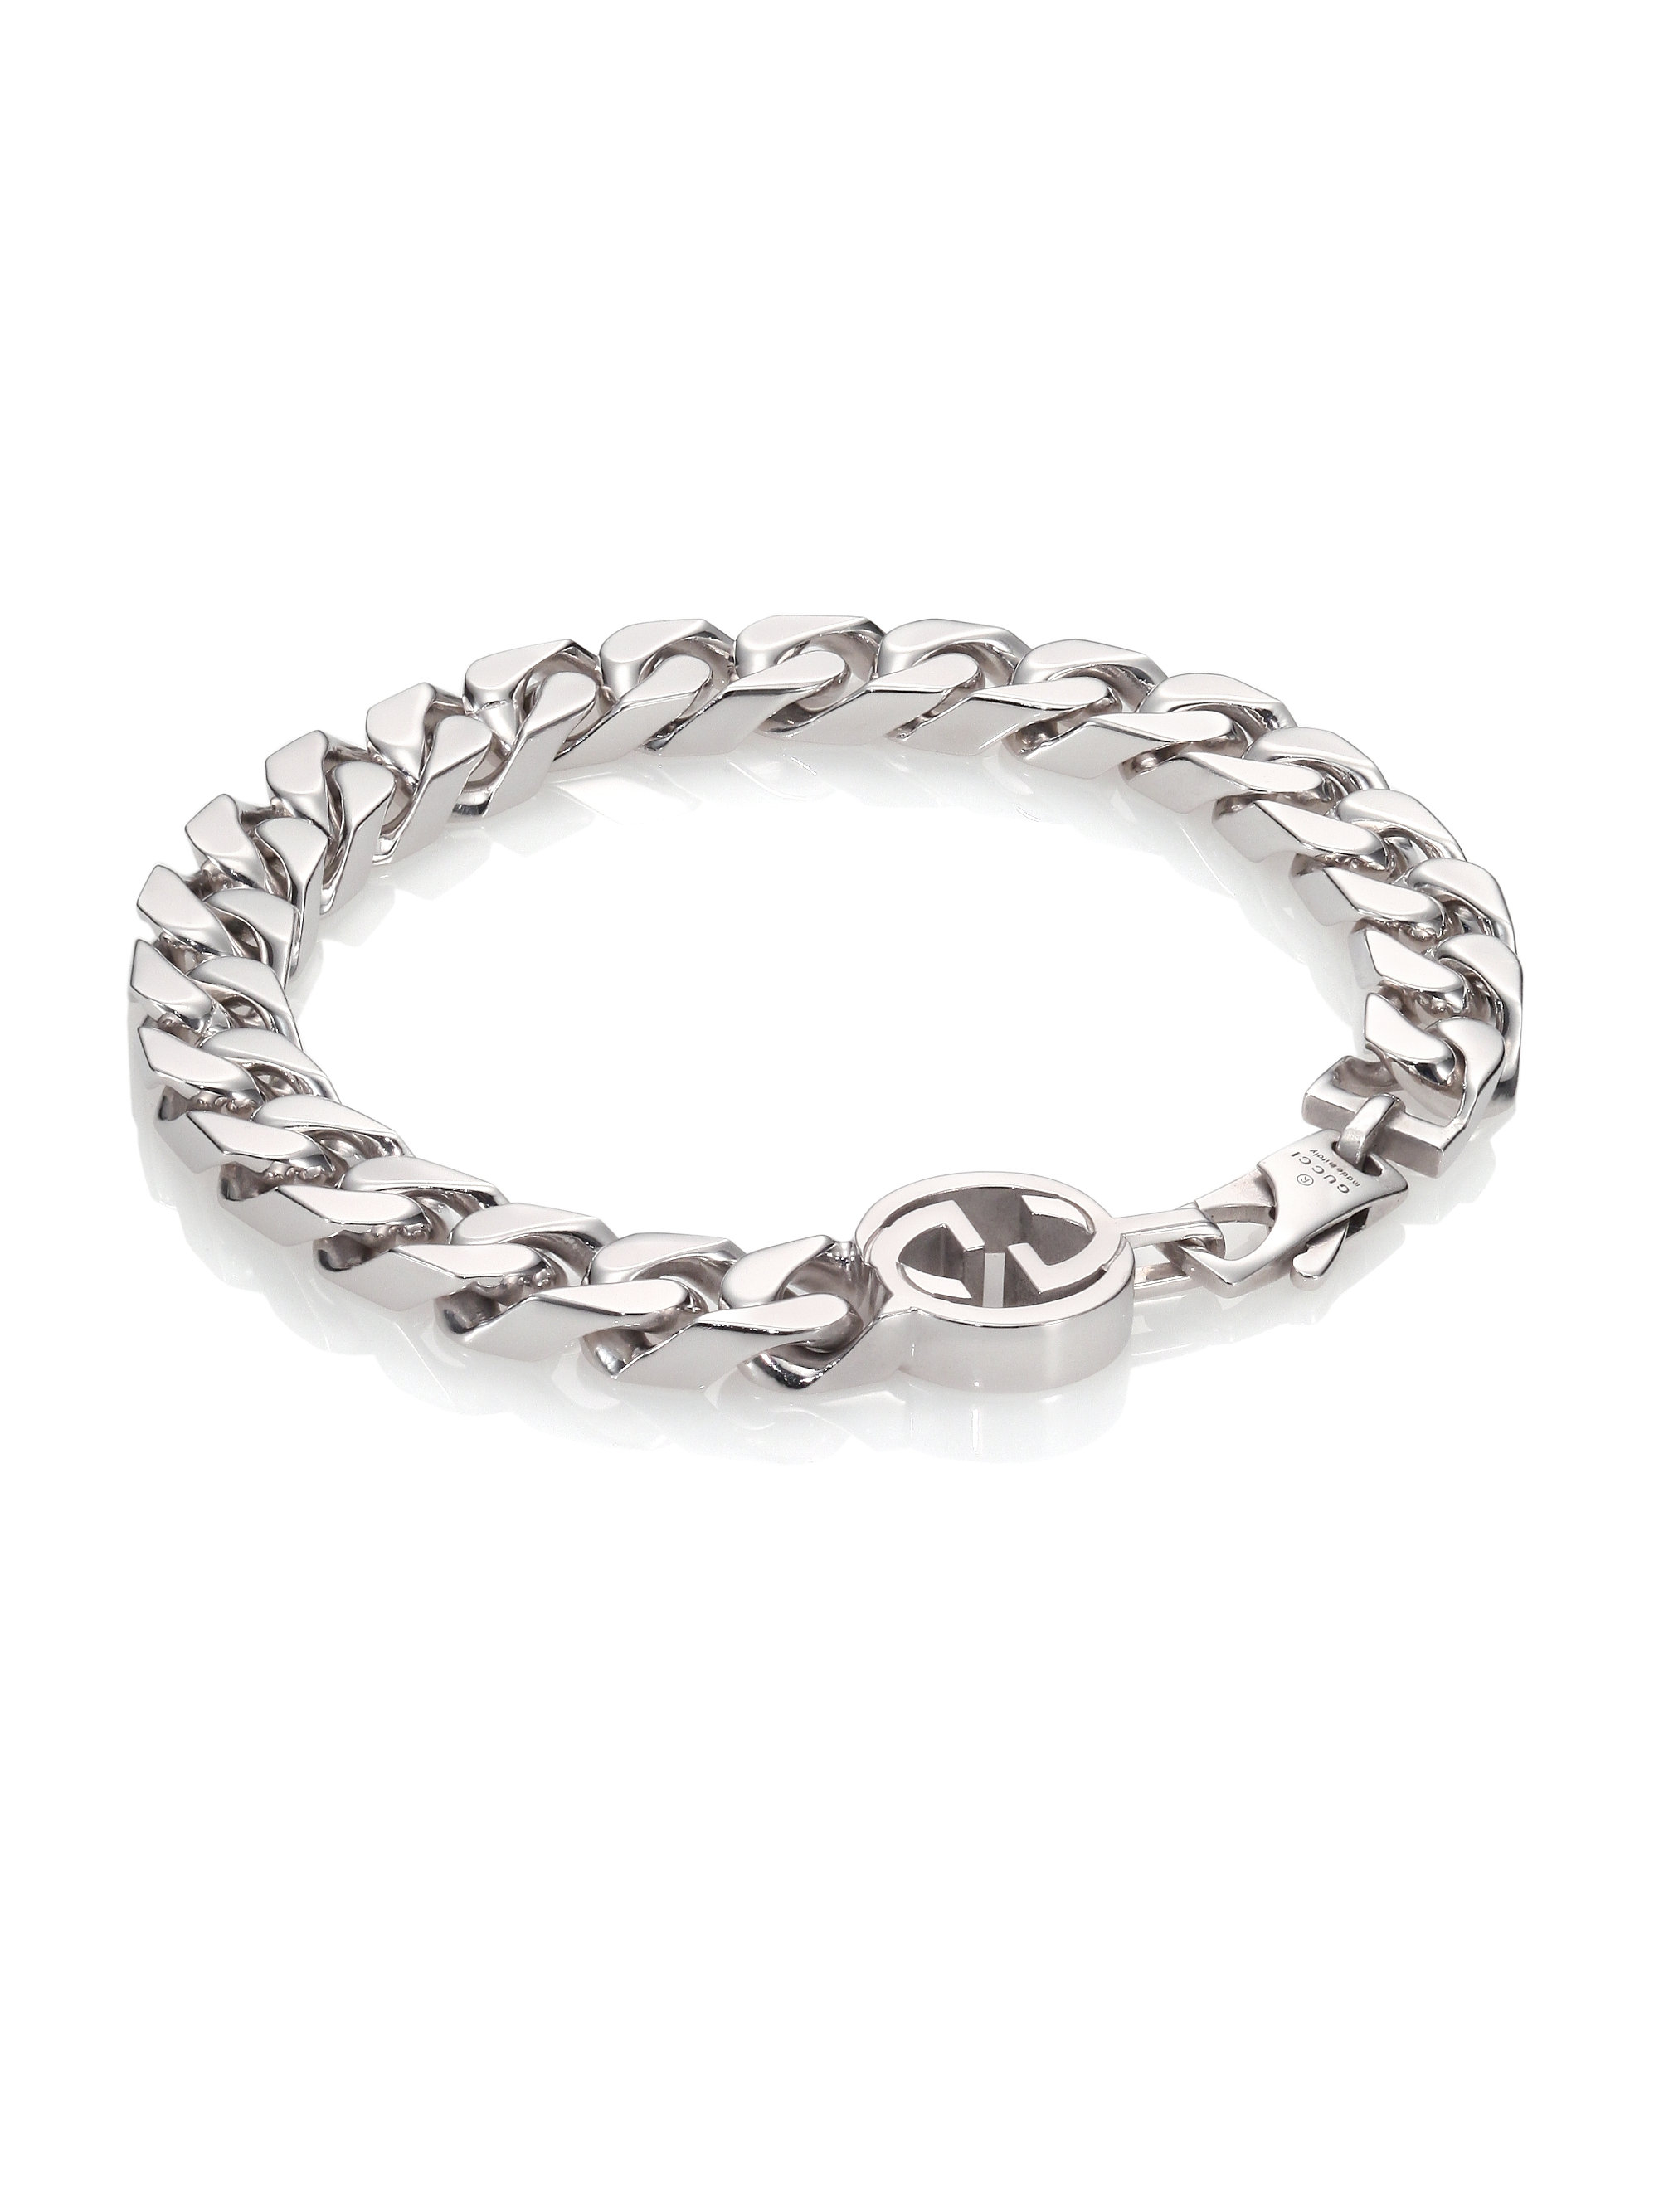 87e38c8b6985 Lyst - Gucci Interlocking Sterling Silver Bracelet in Metallic for Men